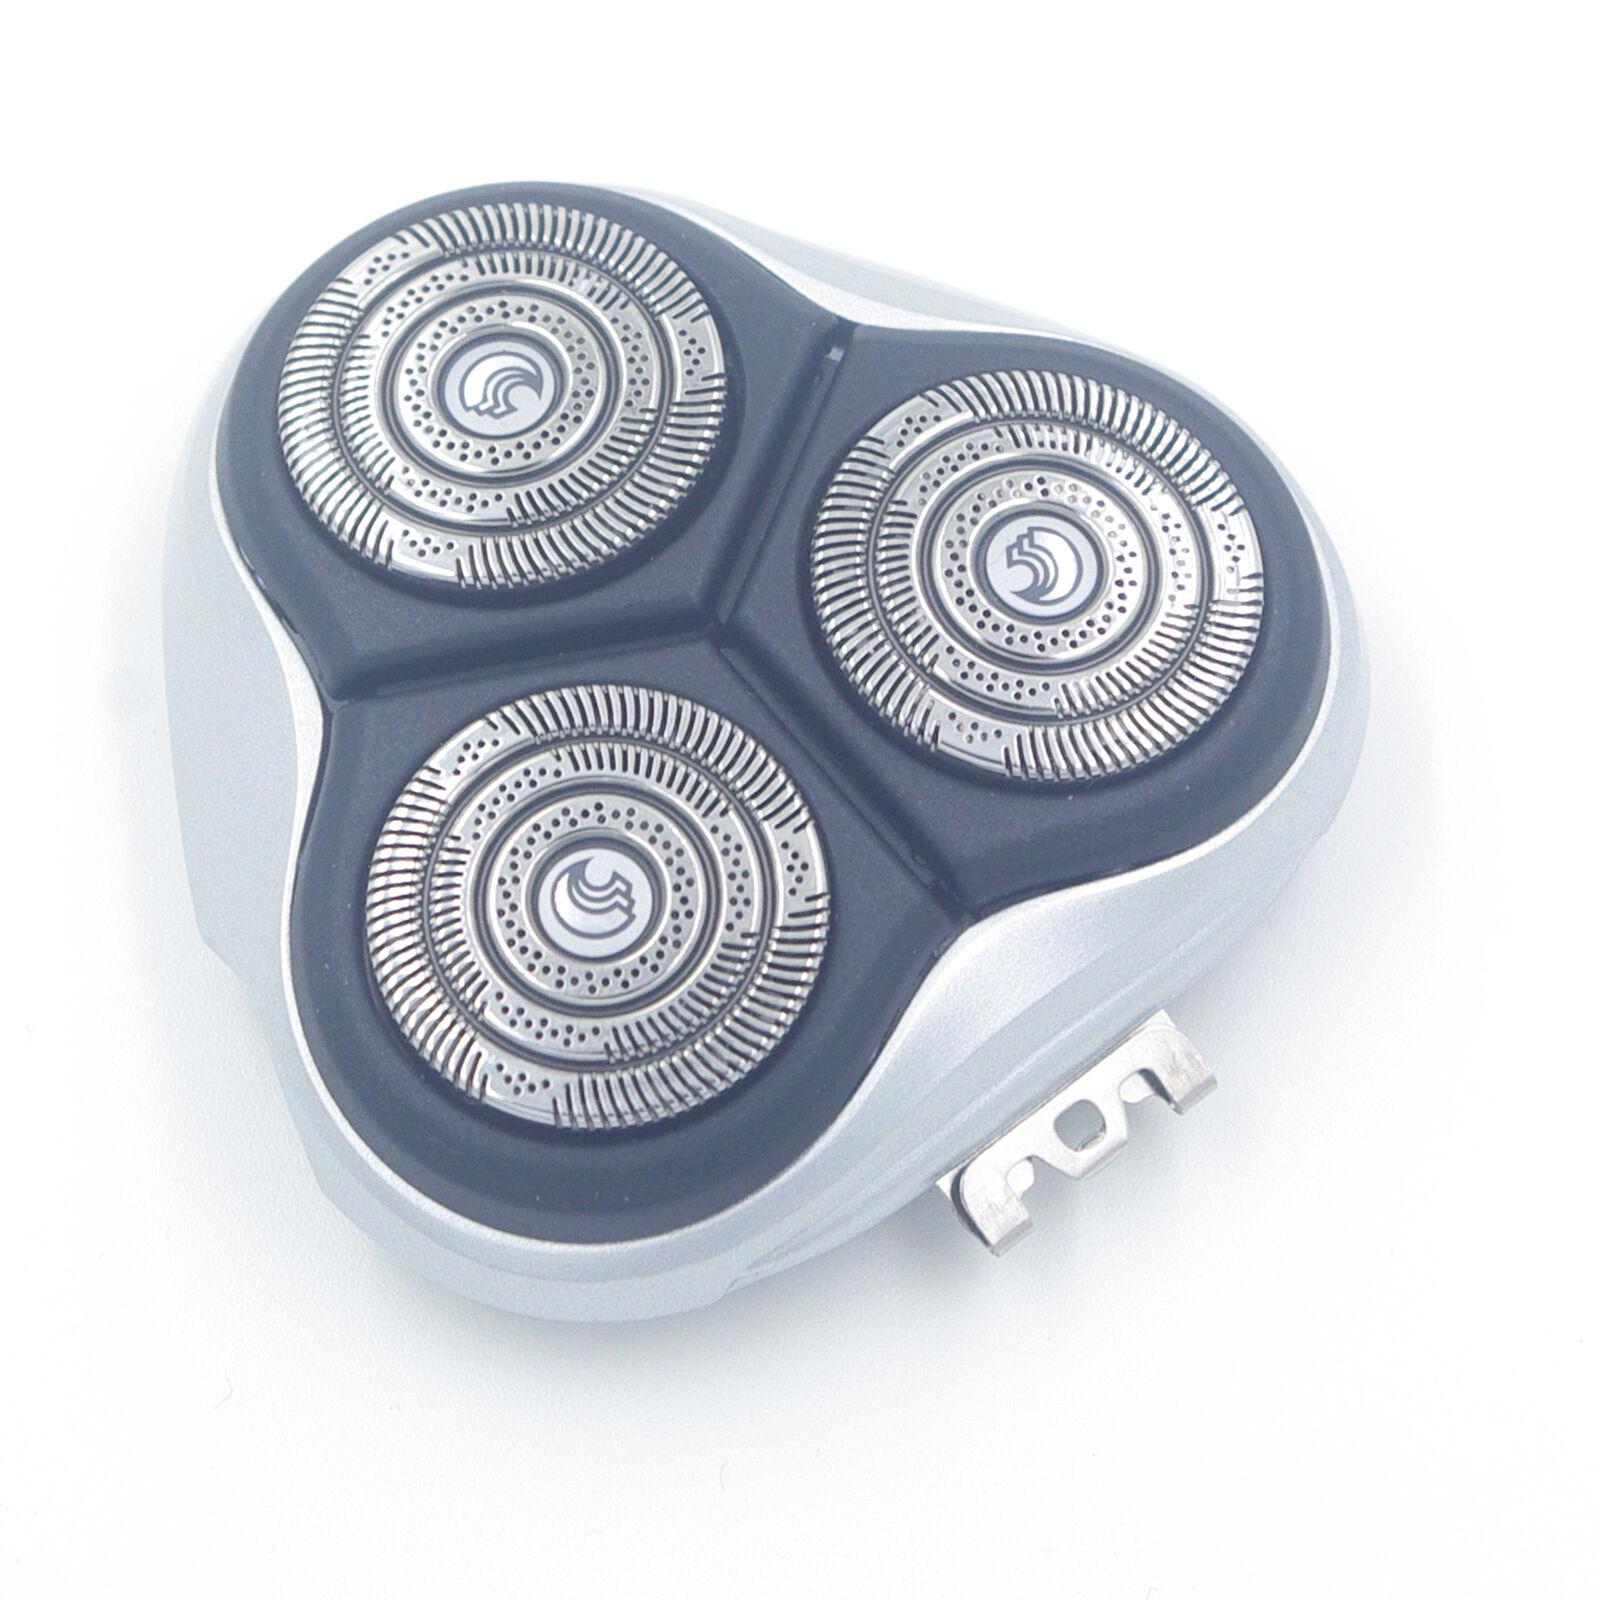 Full Set HQ9 Shaver Head Replacement For Philips AT920 AT921PT870 AT830 AT880 AT895 PT870CC PT927 AT940 PT920 Razor Blade